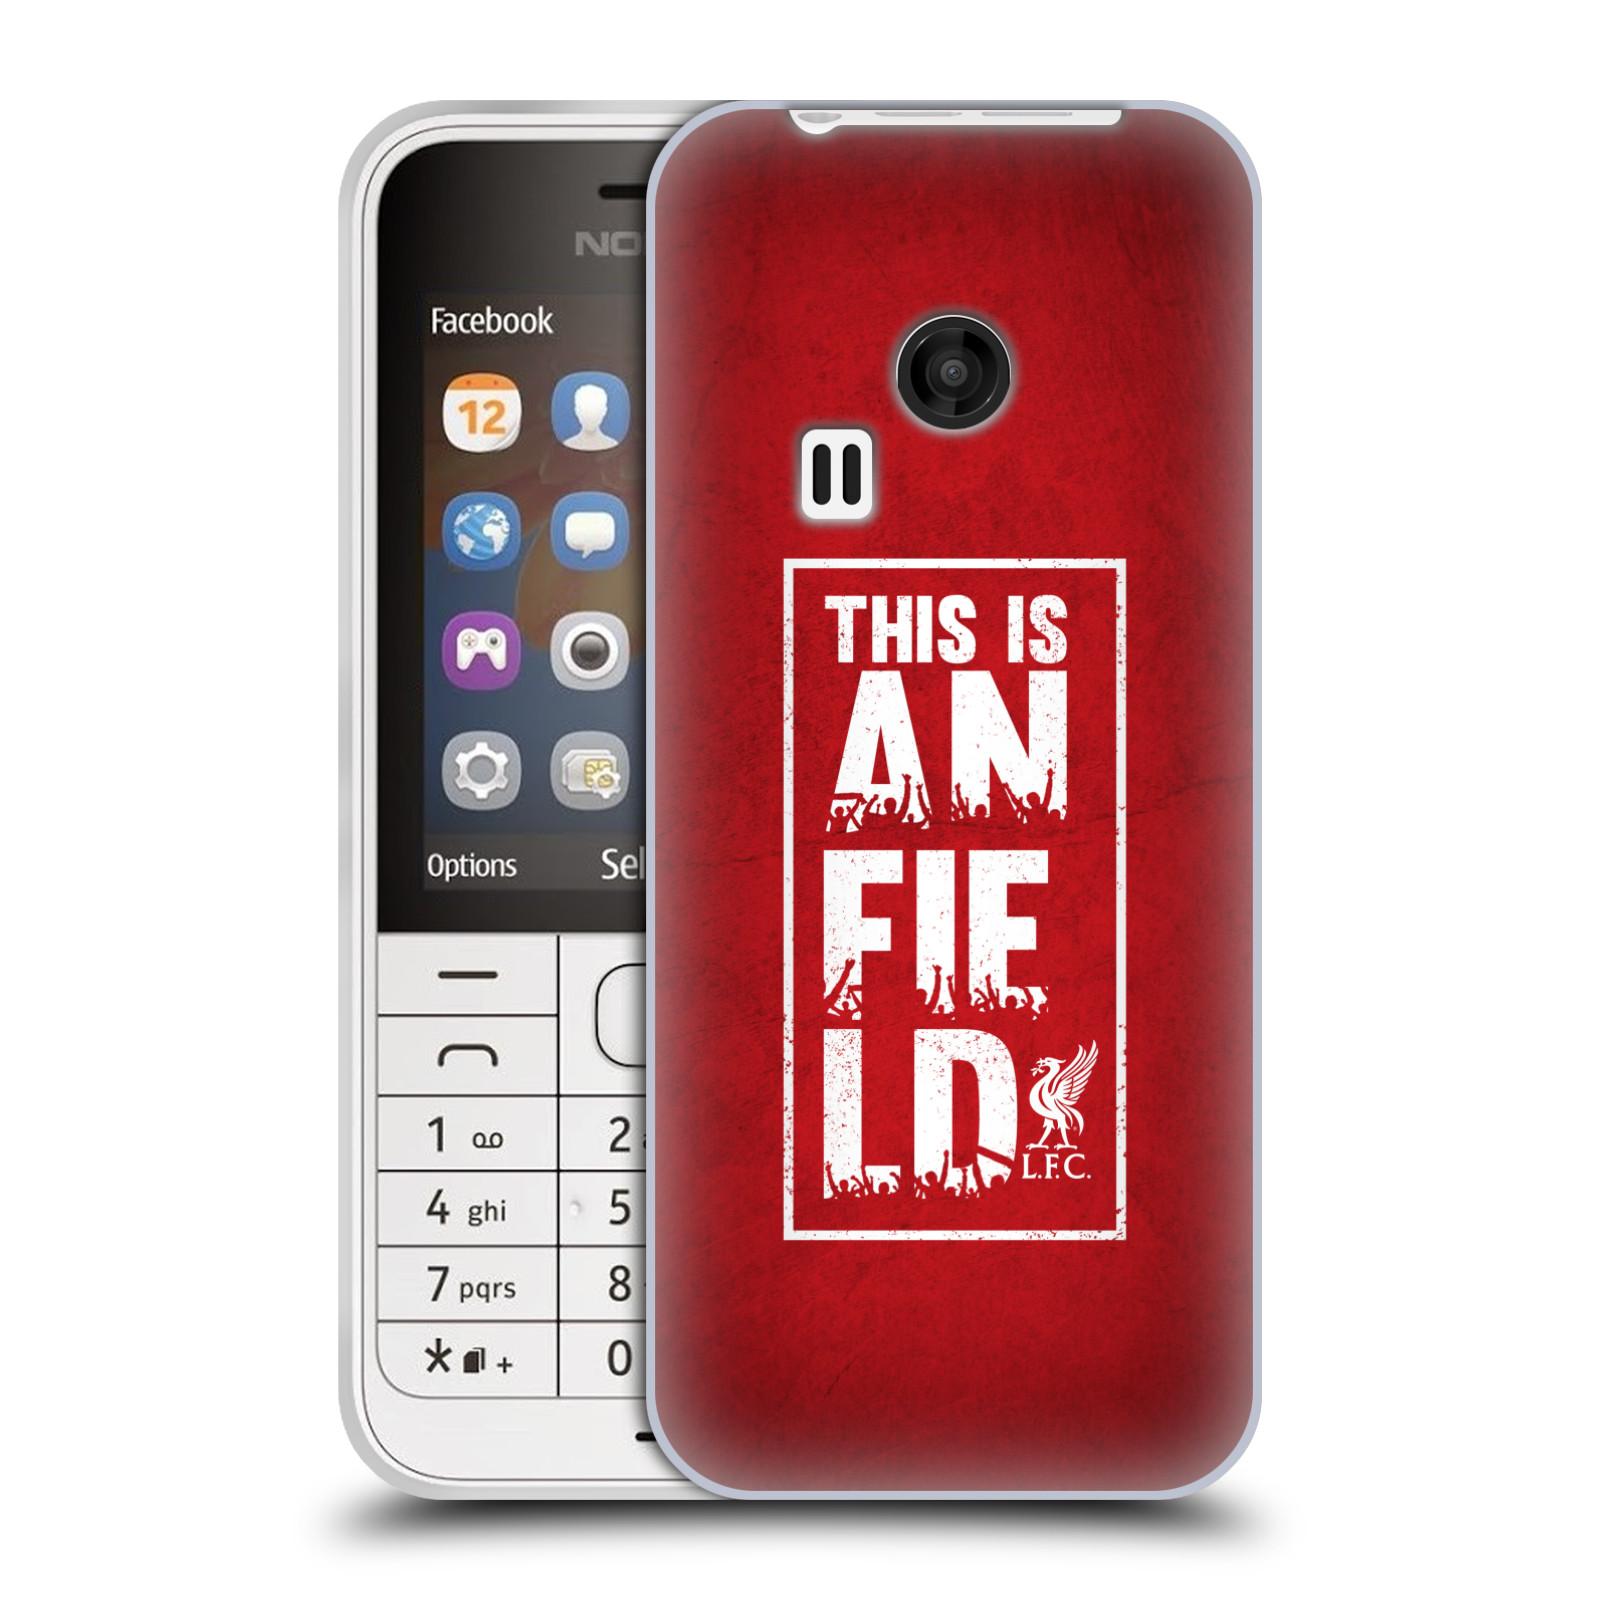 Silikonové pouzdro na mobil Nokia 220 HEAD CASE Liverpool FC This Is Anfield Red (Silikonový kryt či obal na mobilní telefon Liverpool FC Official pro Nokia 220 a 220 Dual SIM)